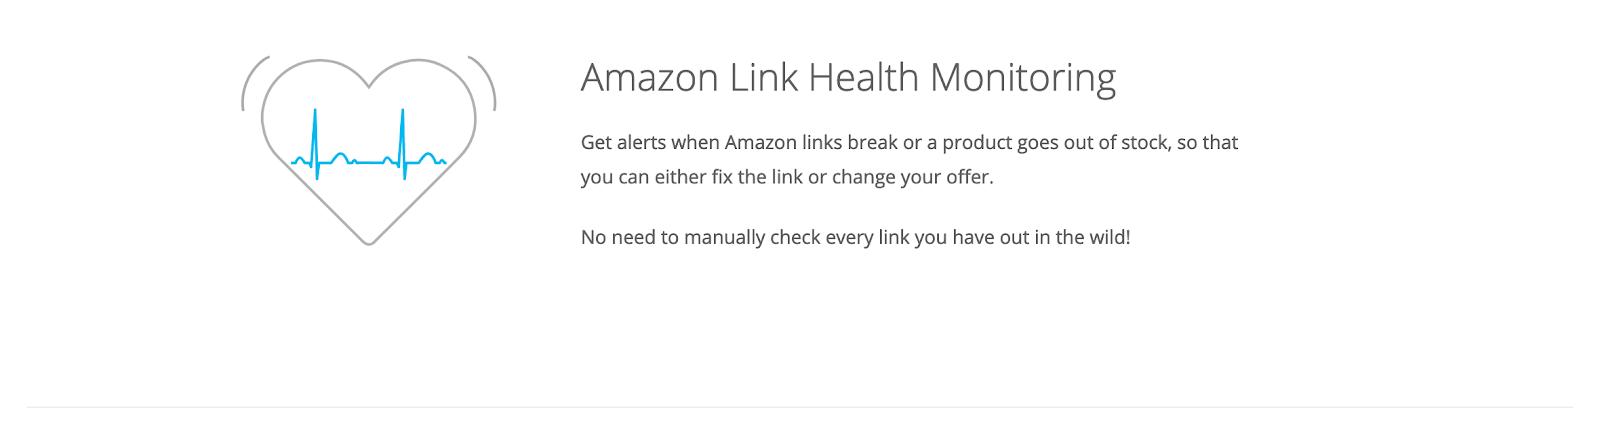 amazon link health